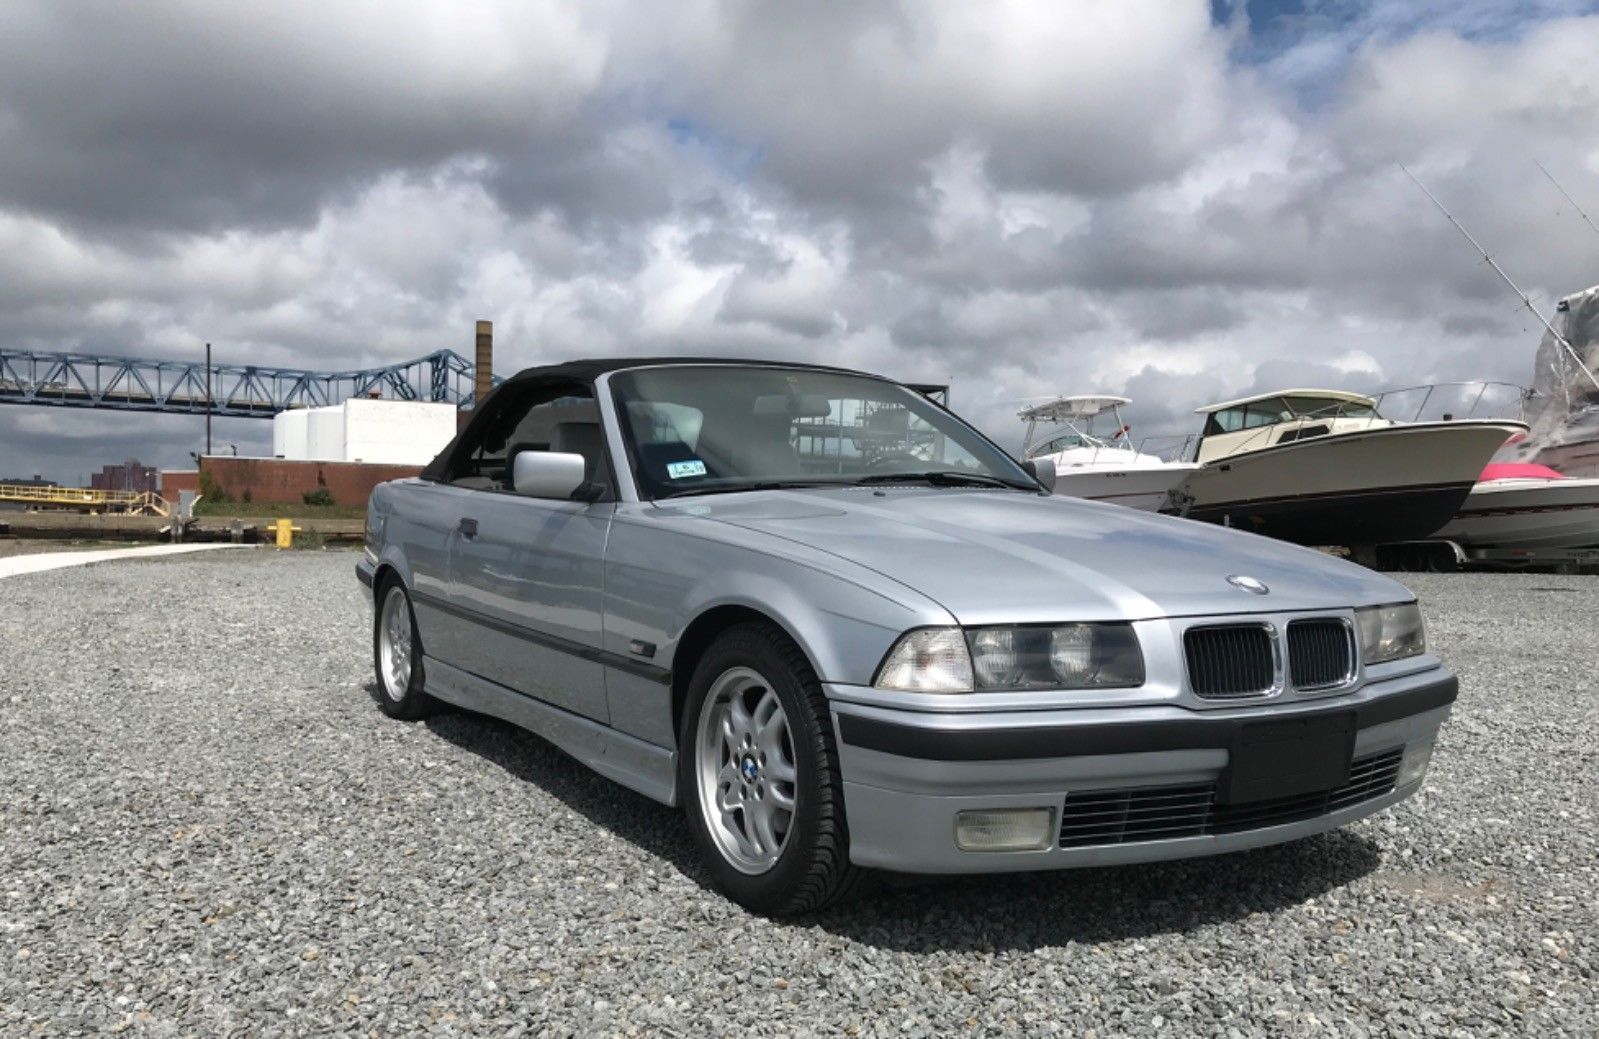 Amazing 1996 BMW 3-Series Convertible Sport 1996 BMW 328i Convertible Sport  3 Series e36 Cabrio 328ic 80k Miles! 2018-2019